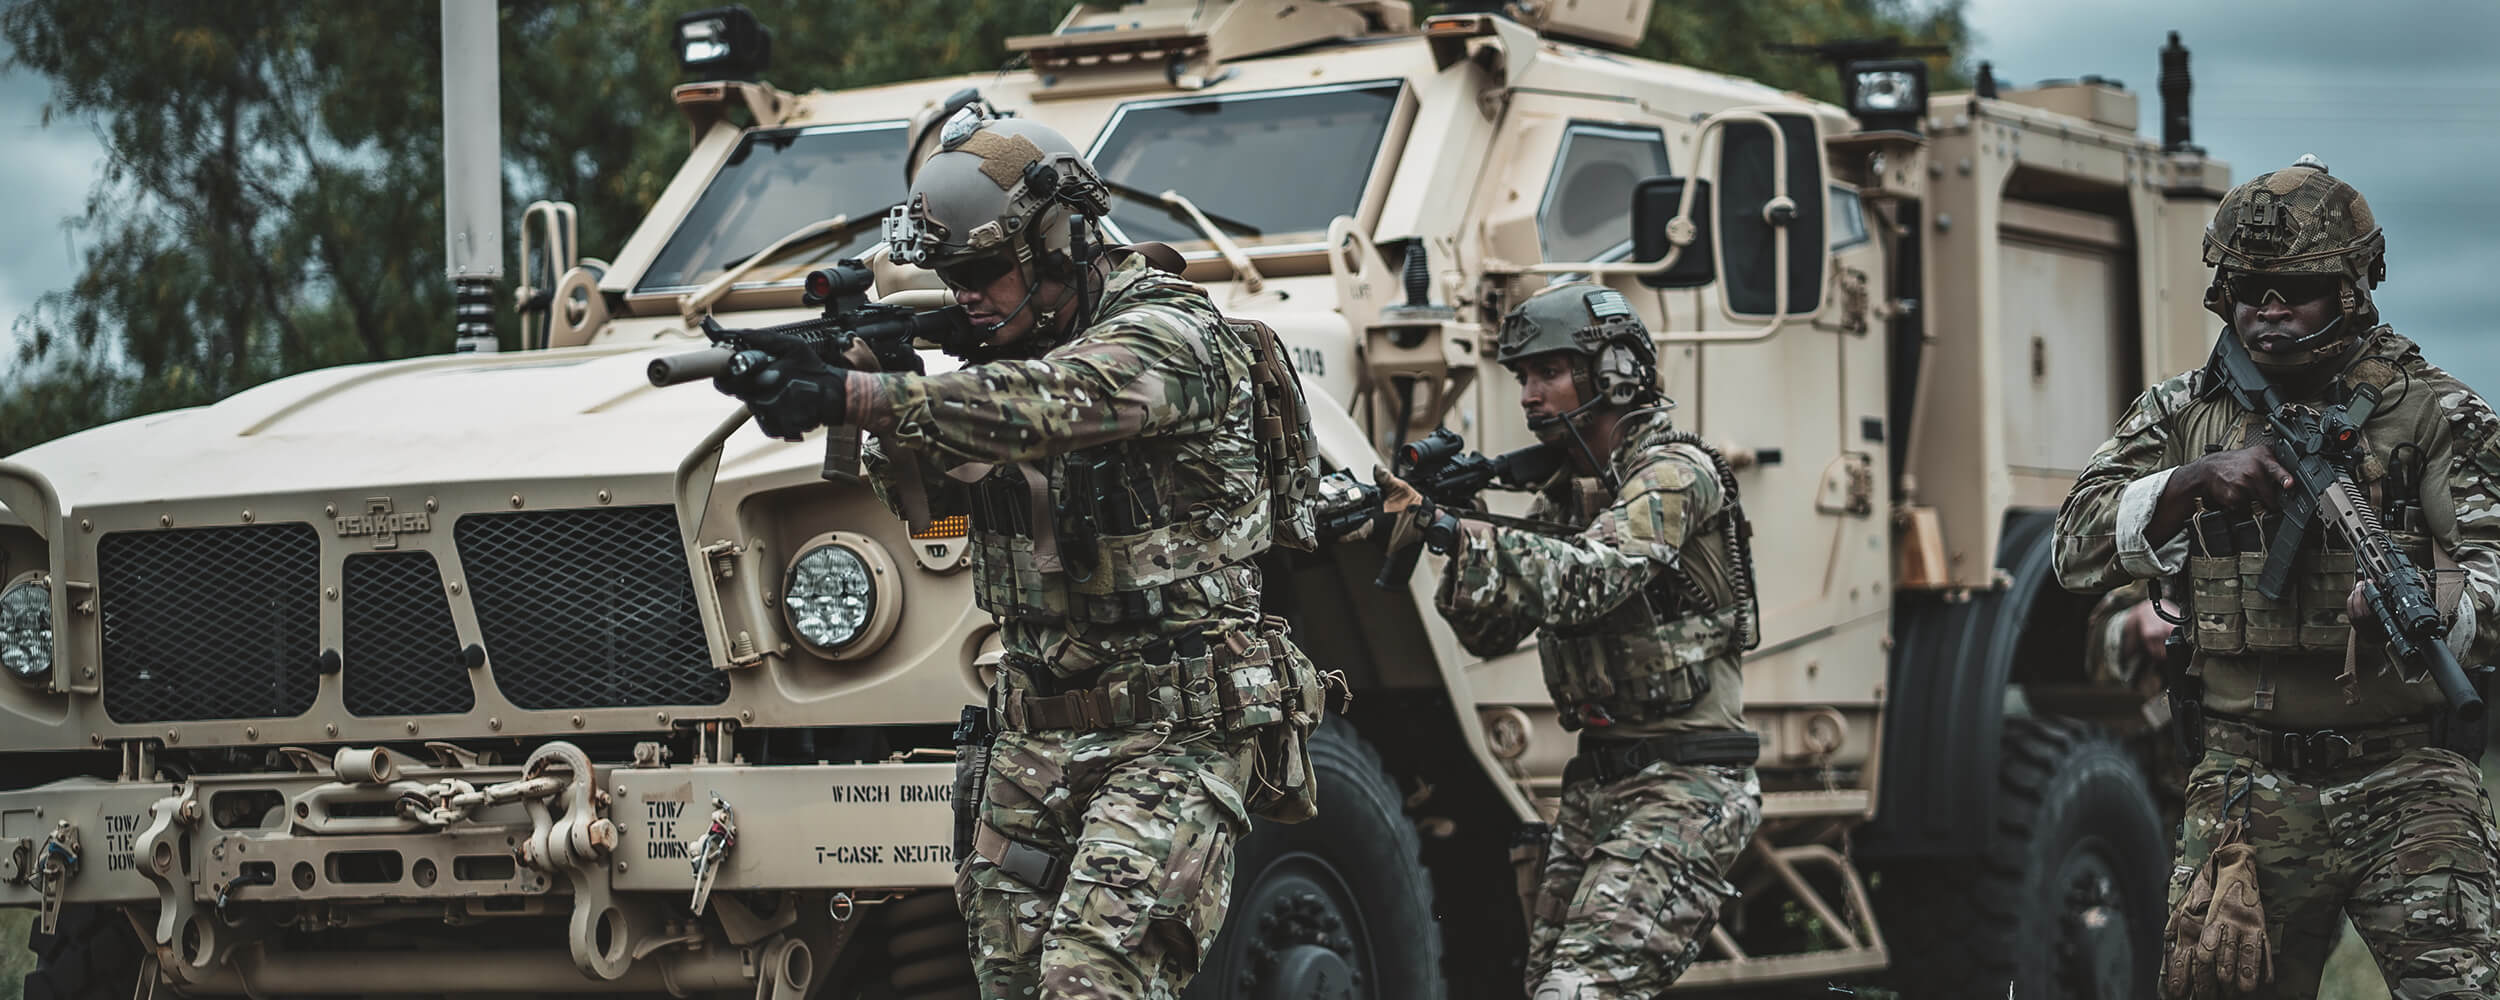 SUREFIRE-military-vehicle-hero-2500x1000px